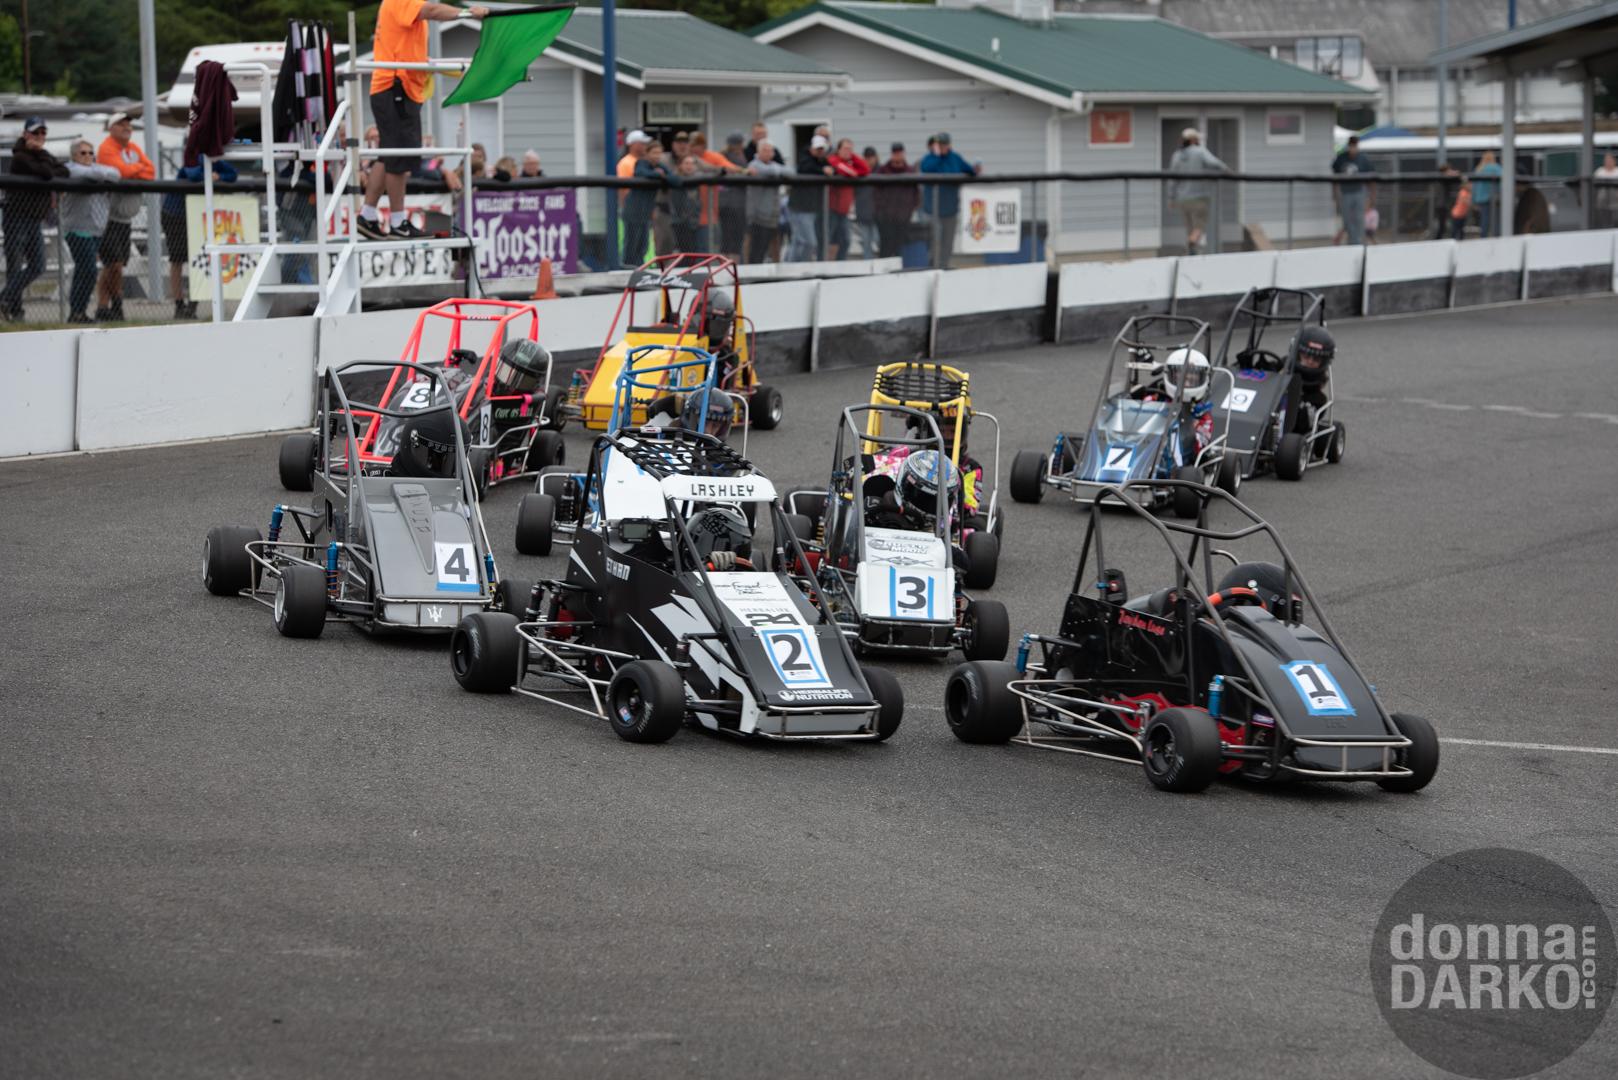 QWMA (Racing) 8-11-2019 DSC_5766.jpg